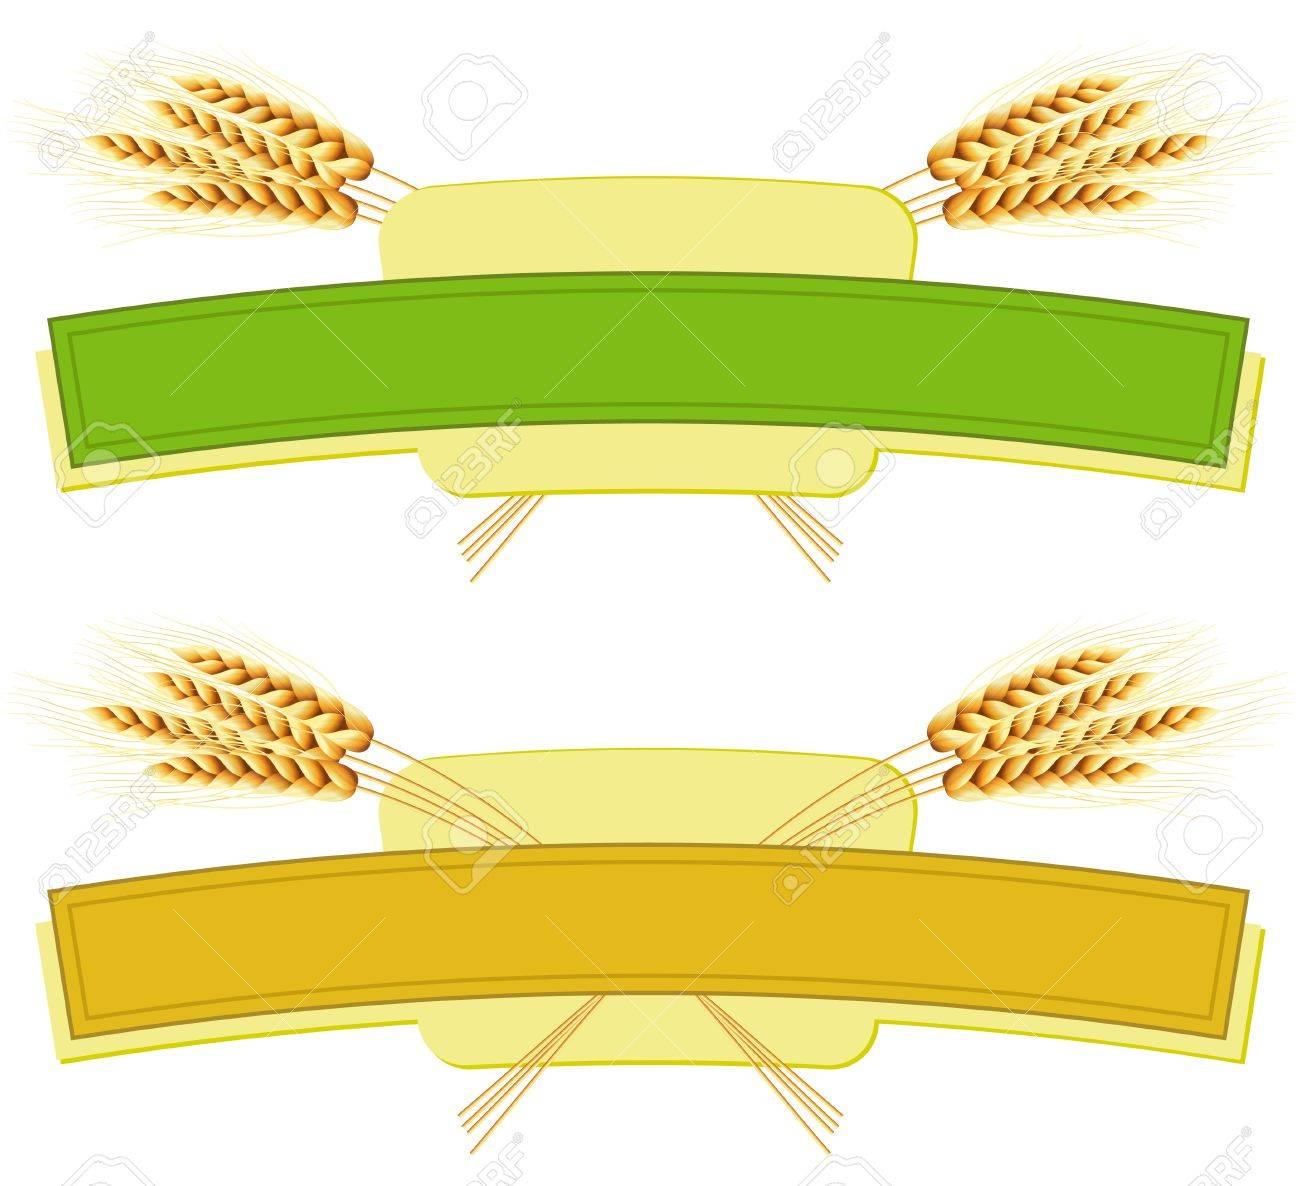 Package desing. Wheat flour or Pasta, macaroni, spaghetti. Stock Vector - 9878232